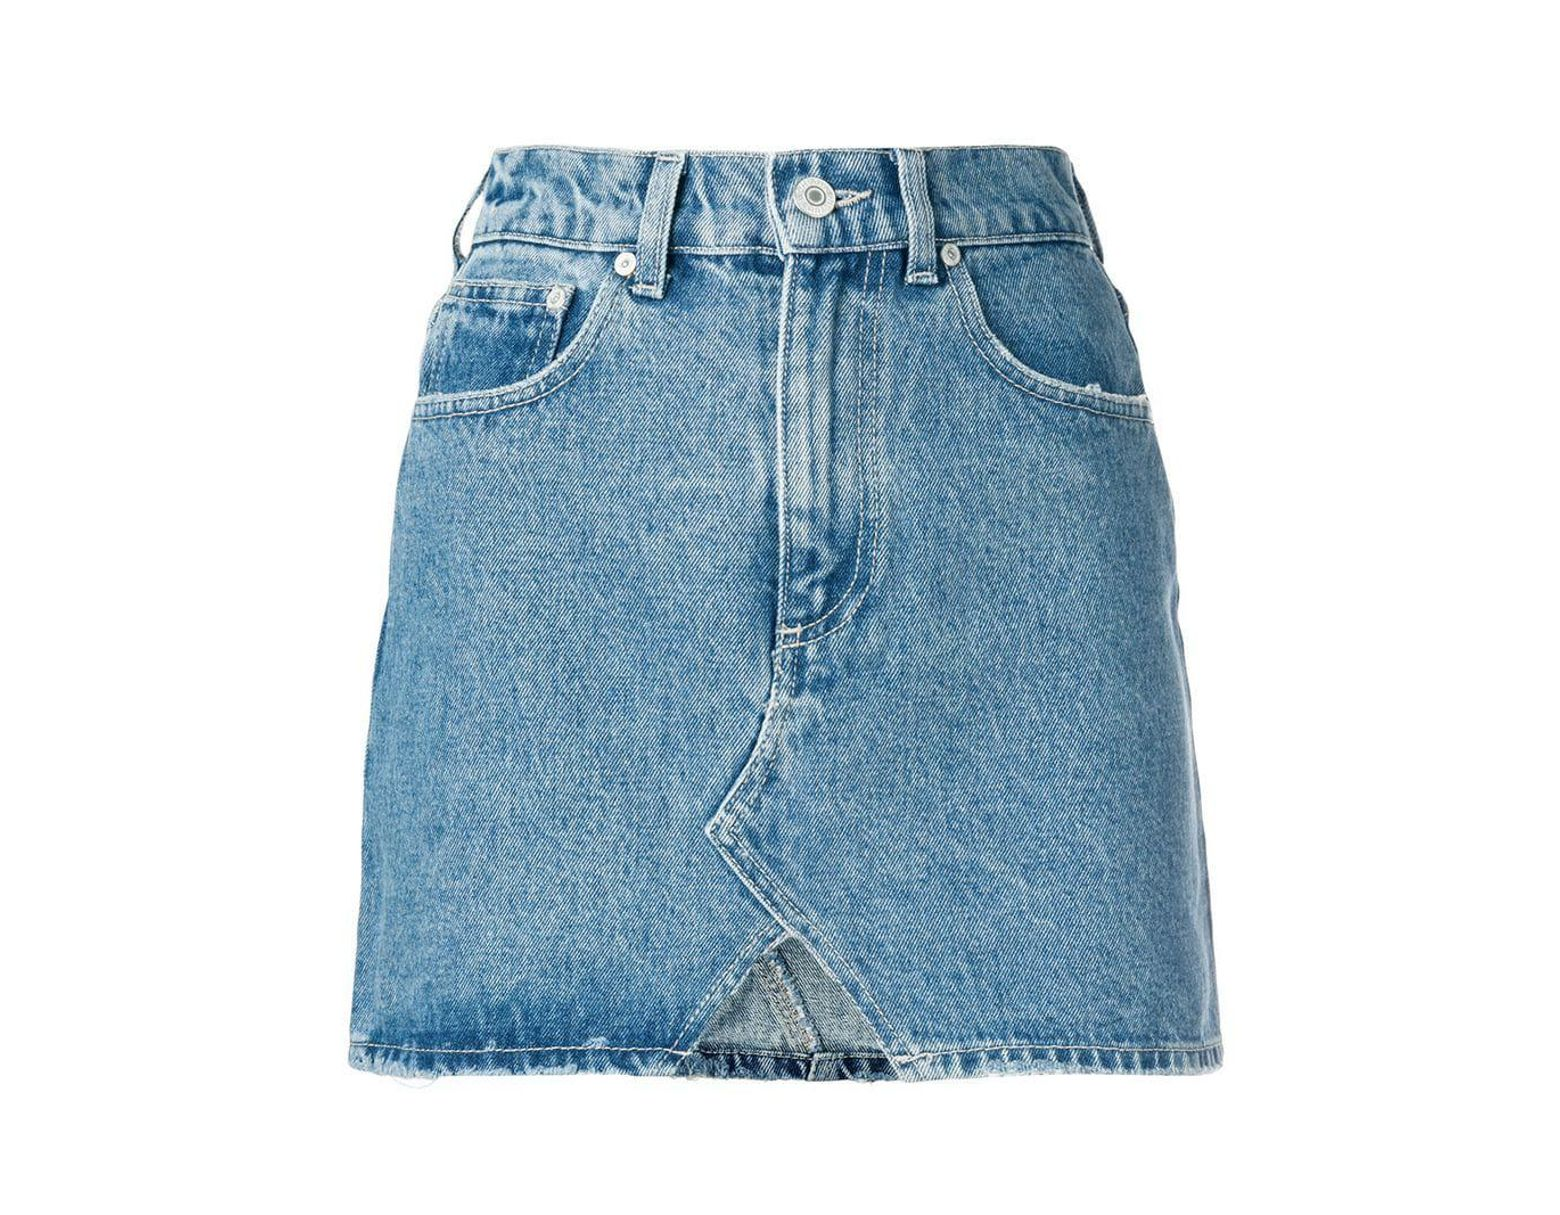 44a93834cd Chiara Ferragni Blue Cotton Skirt in Blue - Save 25% - Lyst